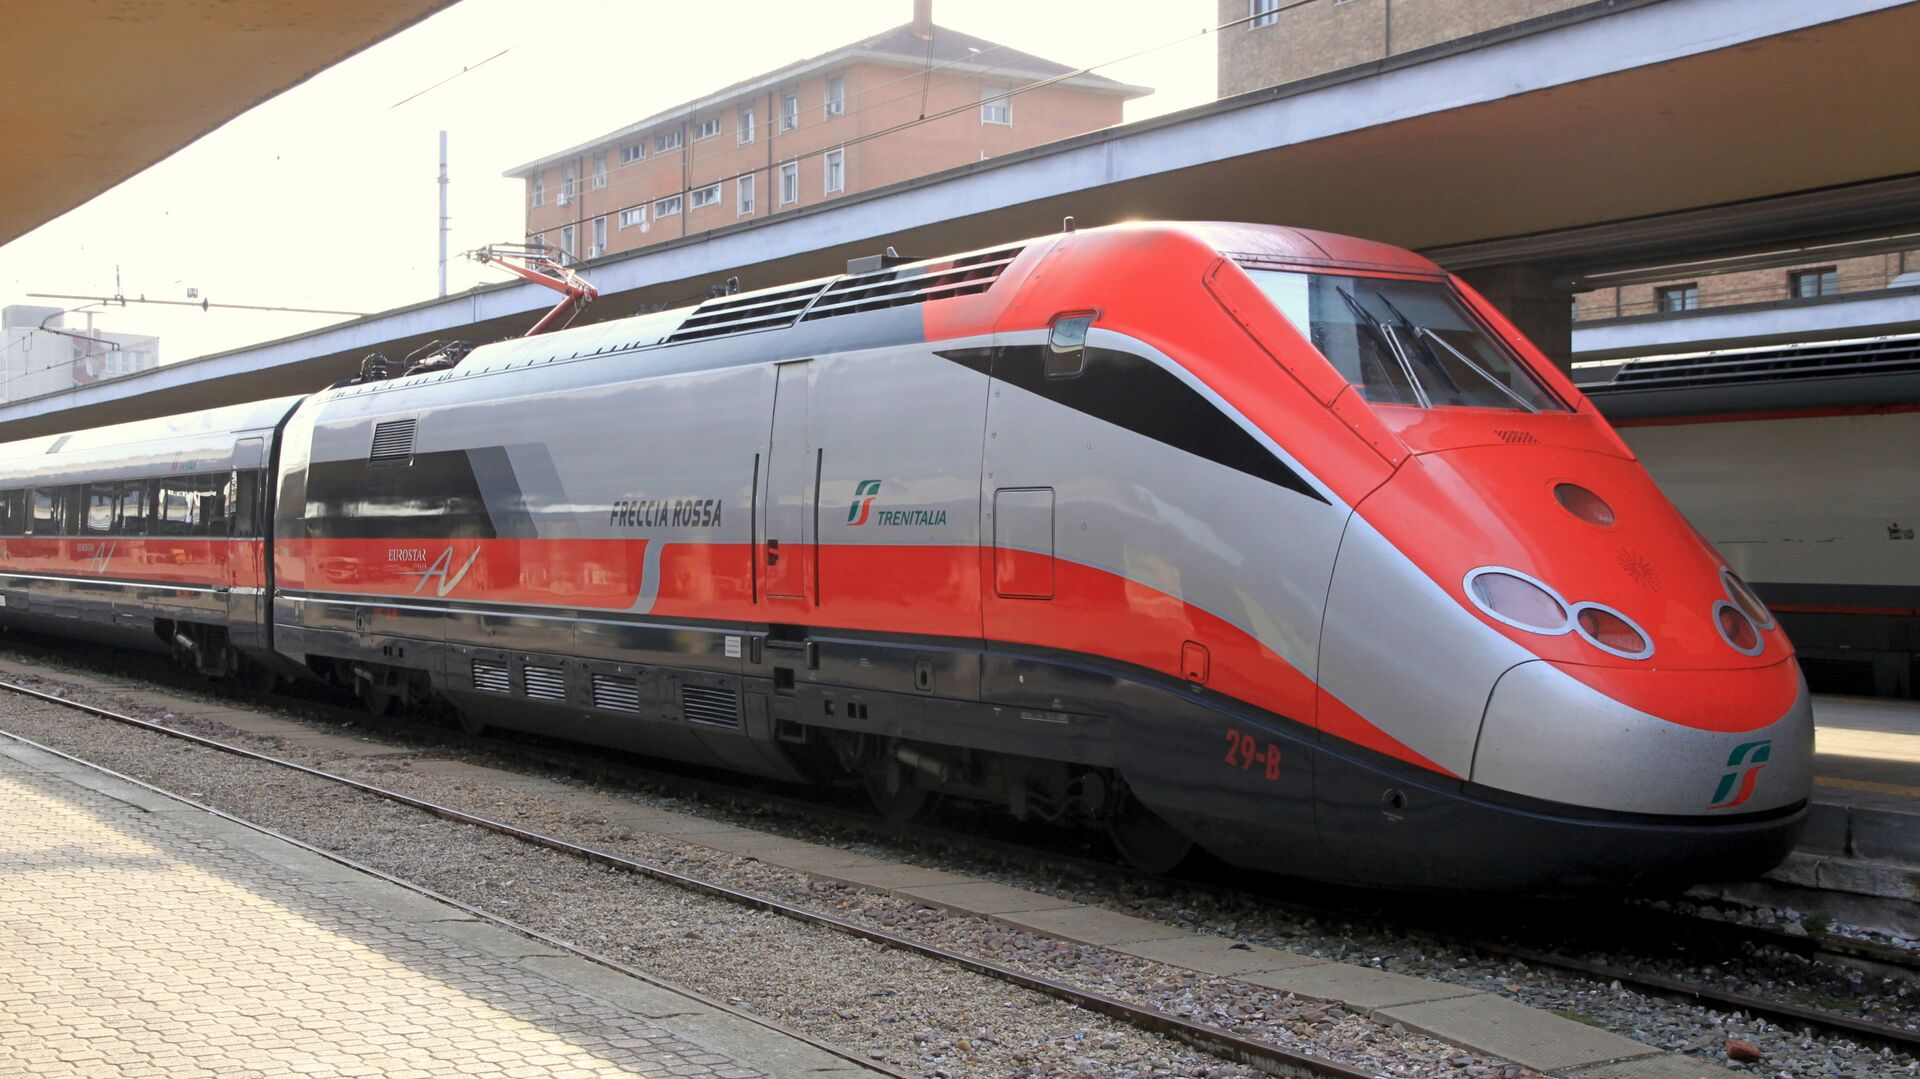 Treno Freccia Rossa - Sputnik Italia, 1920, 08.03.2021